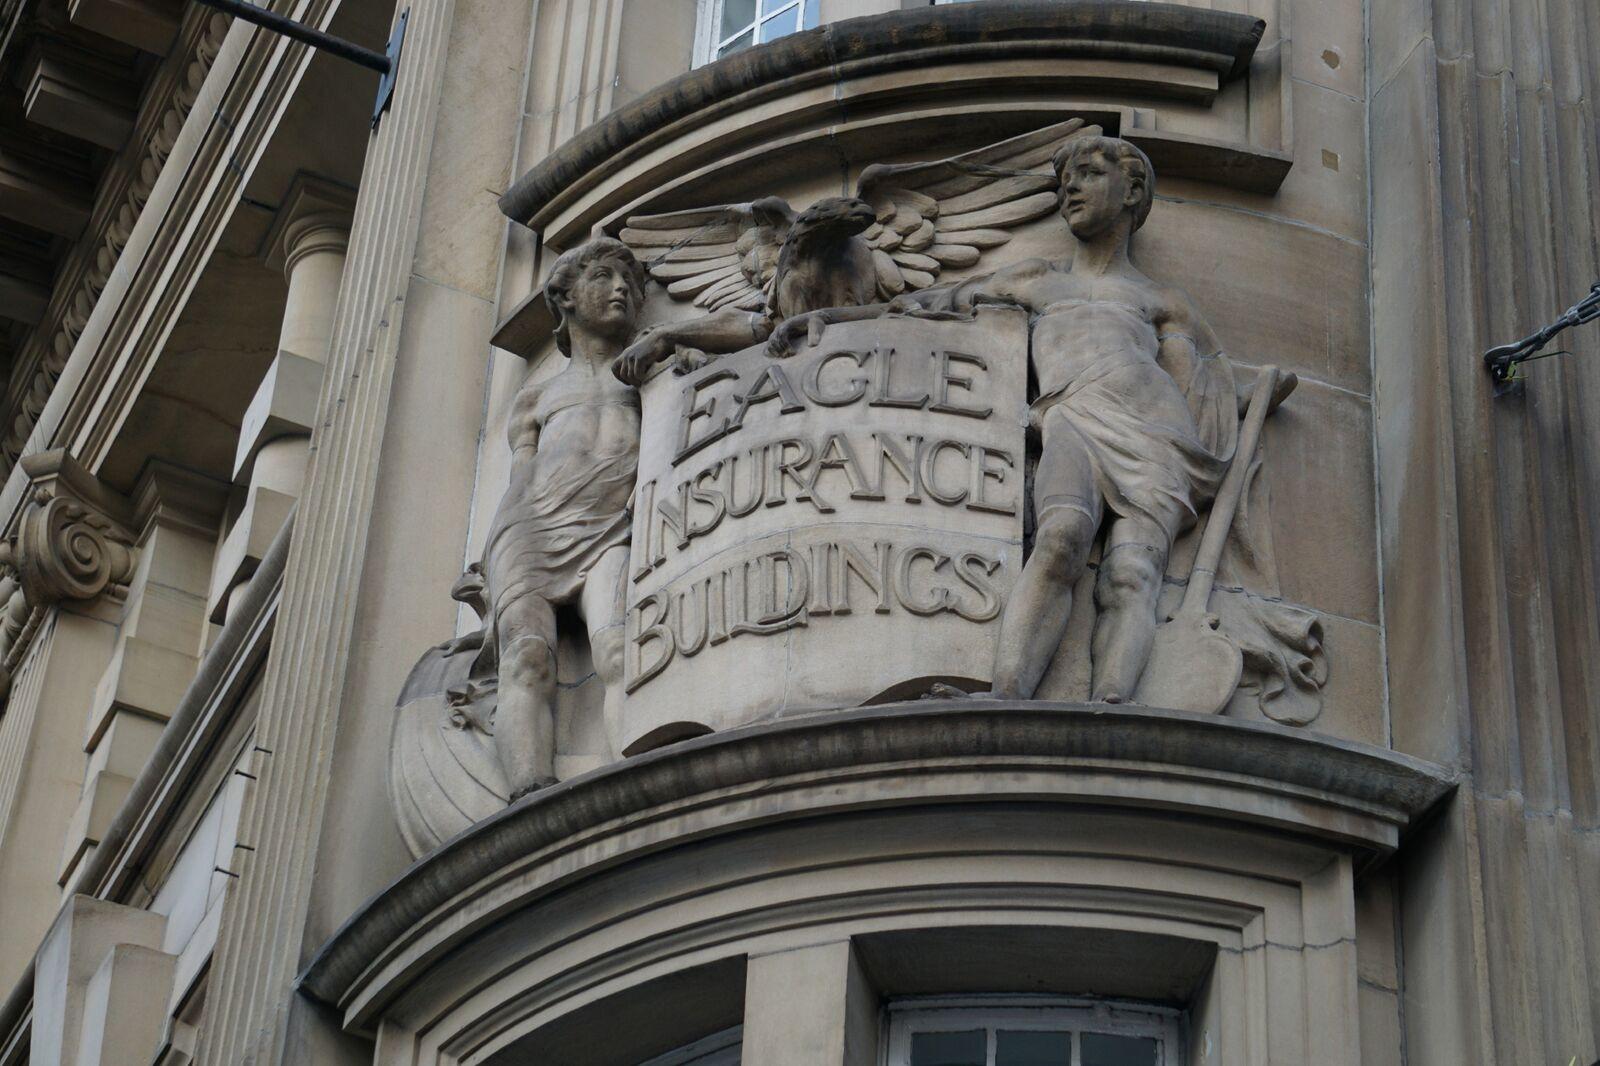 Eagle Insurance Building